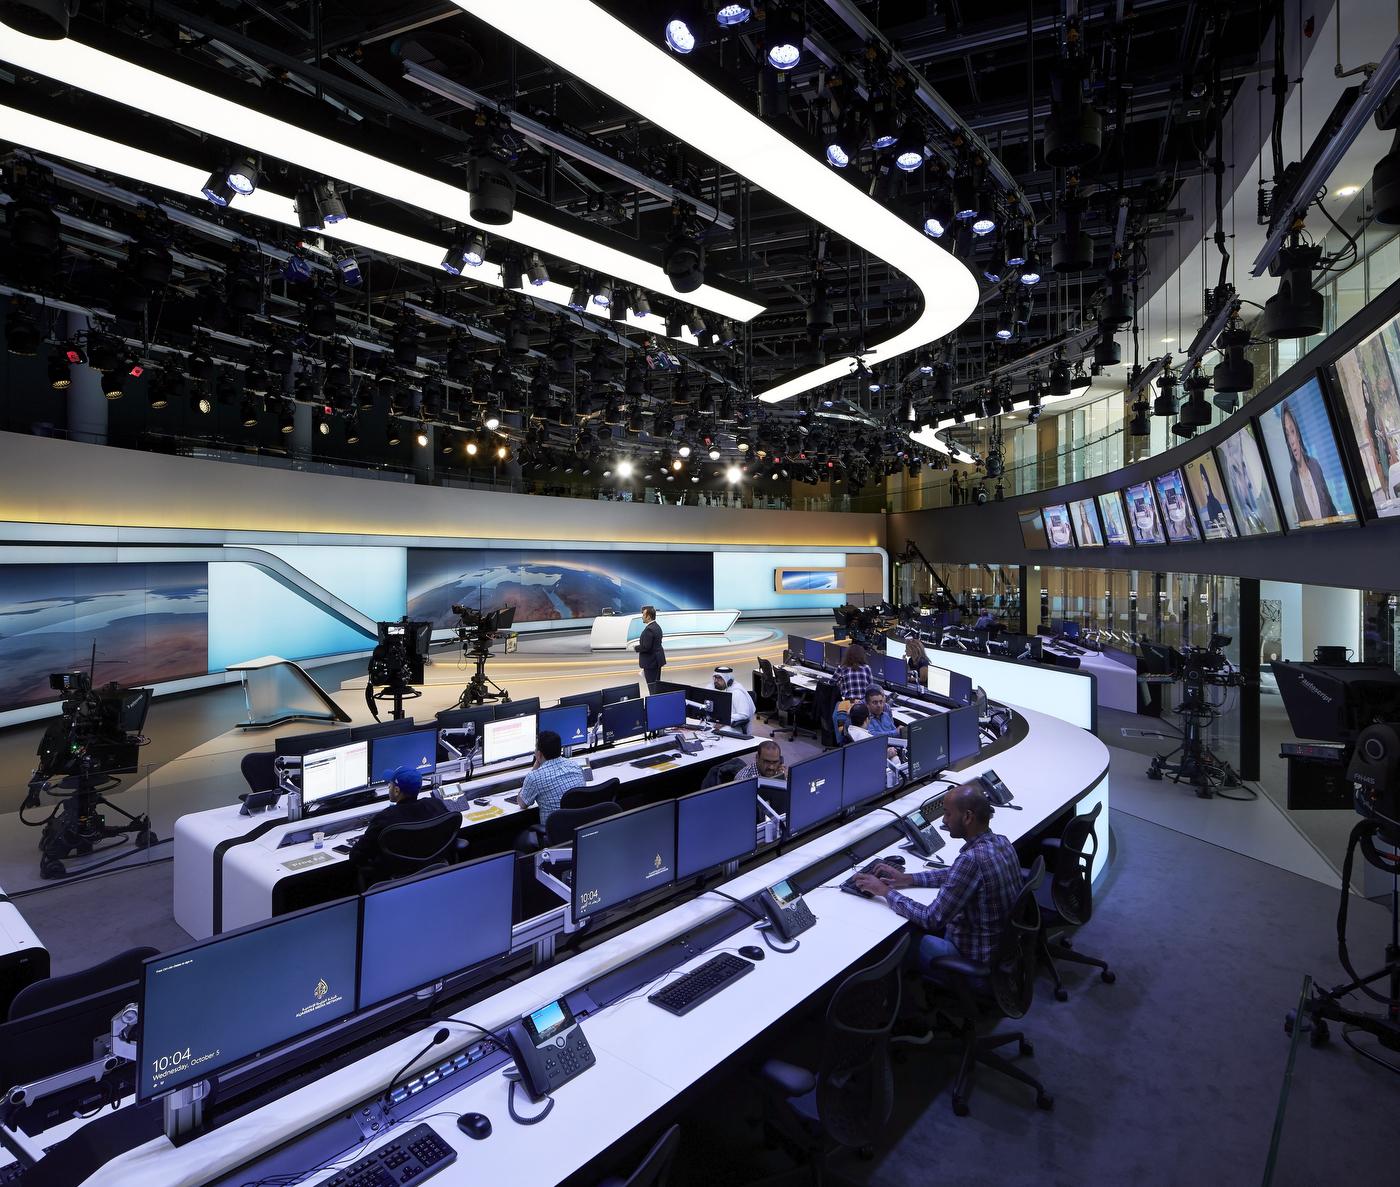 NCS_Al-Jazeera-Newsroom-Studio-5_0011